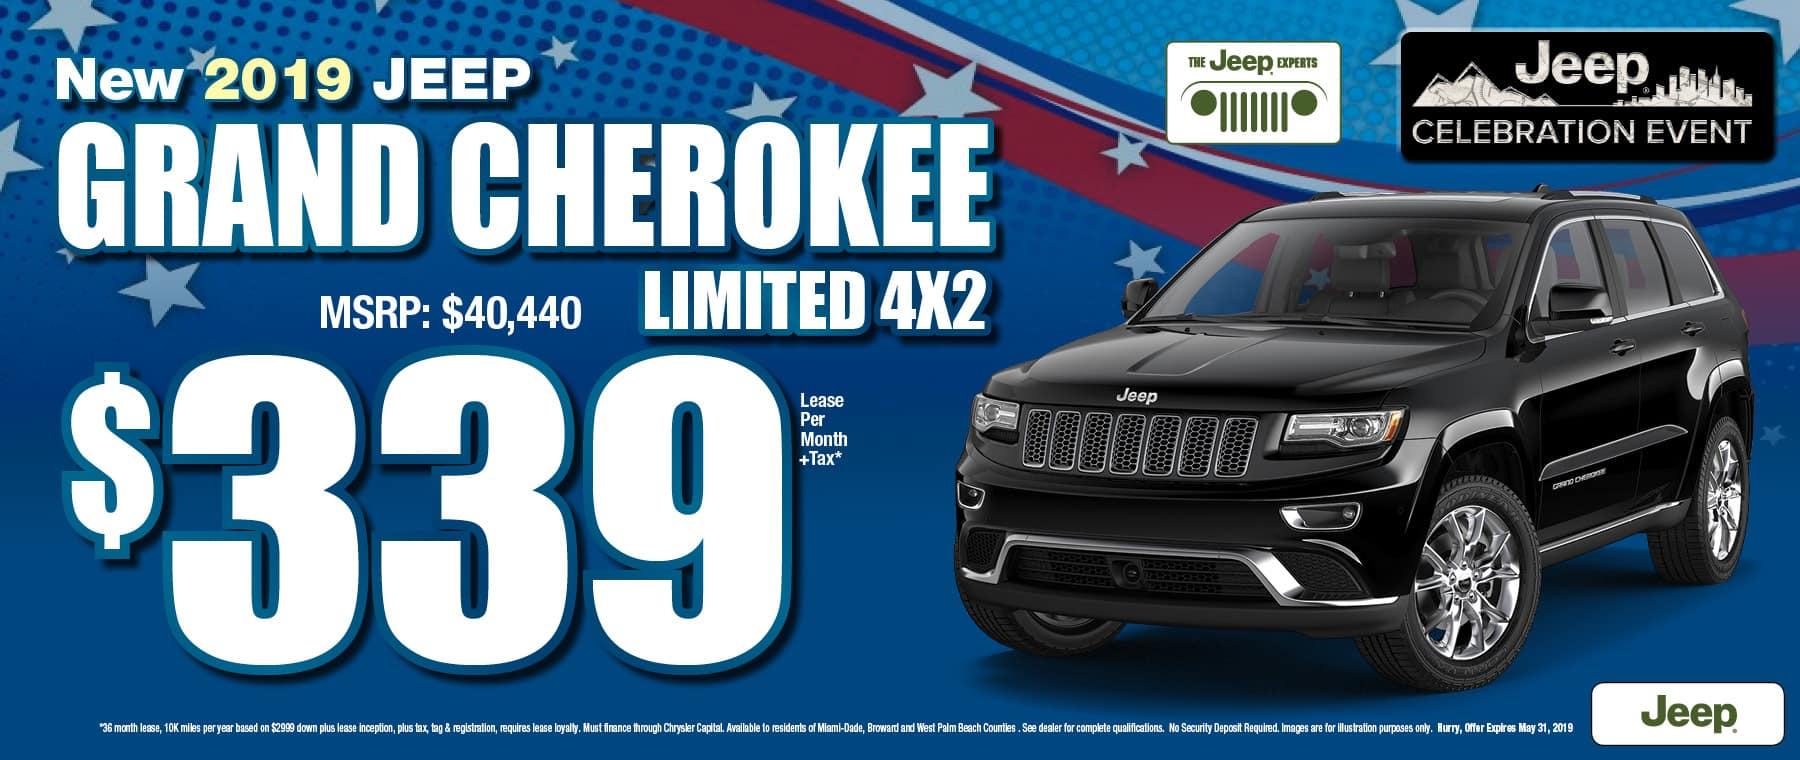 Grand Cherokee $339 Lease